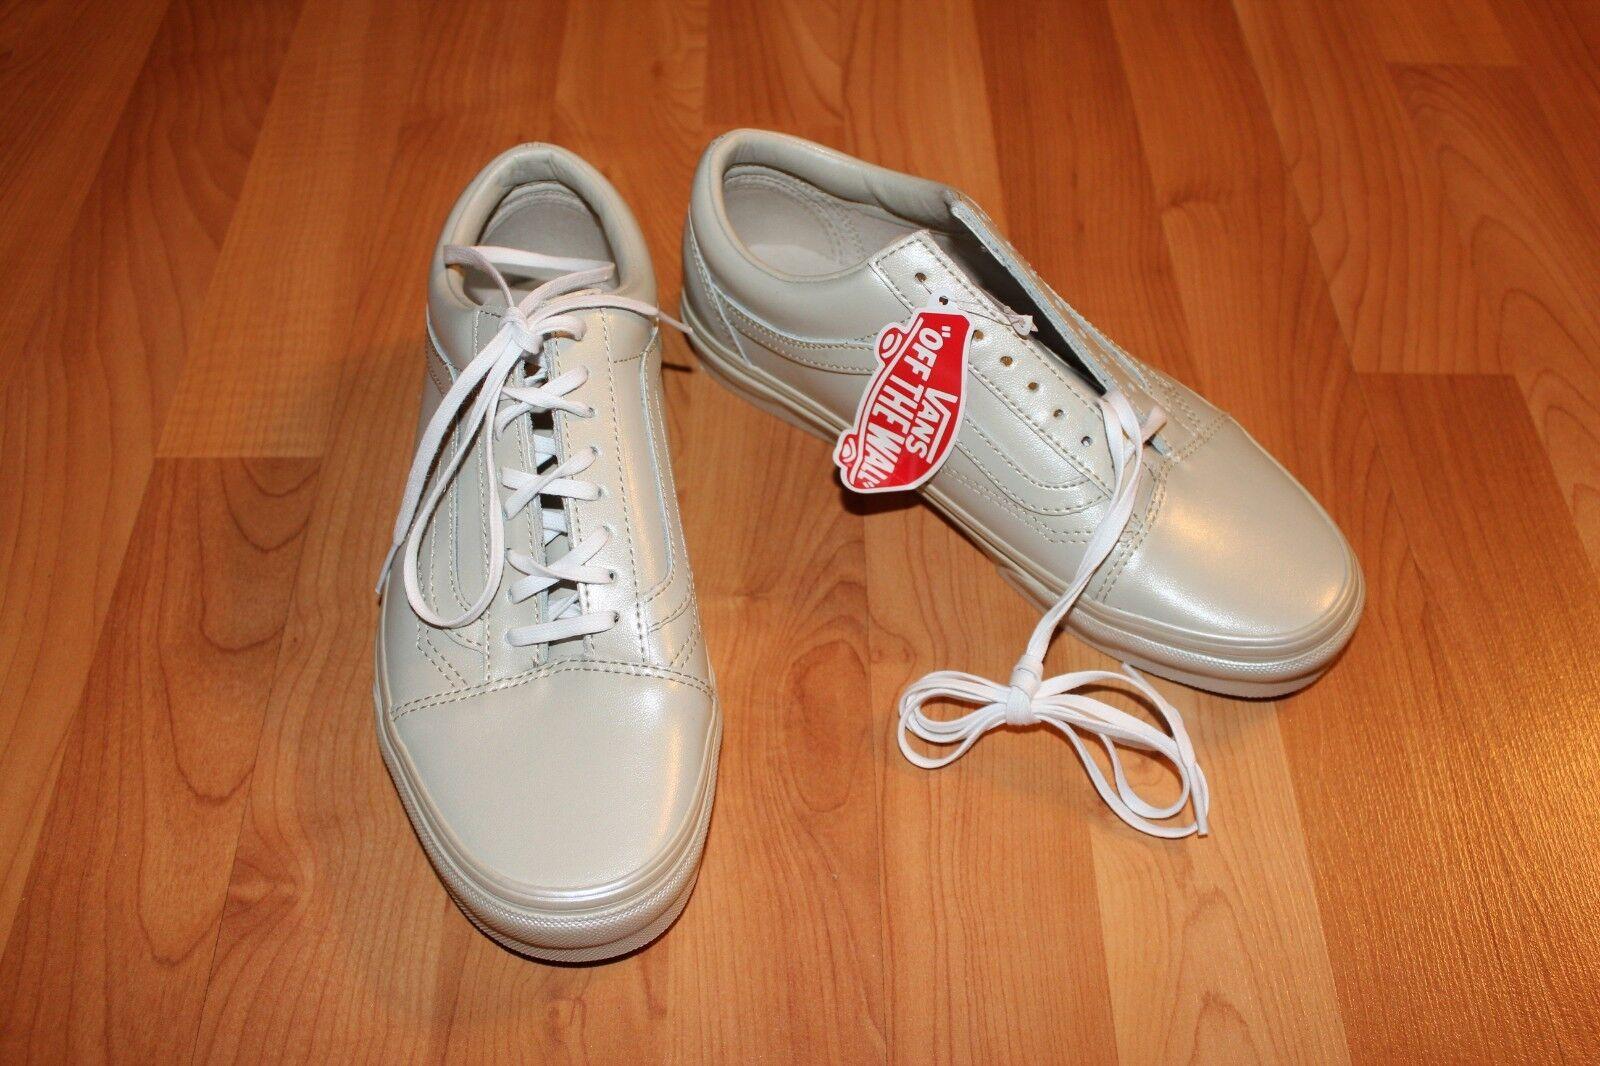 NEW Women's Sz 8.5 VANS Old Skool Metallic Sidew Retro style Sneakers shoes